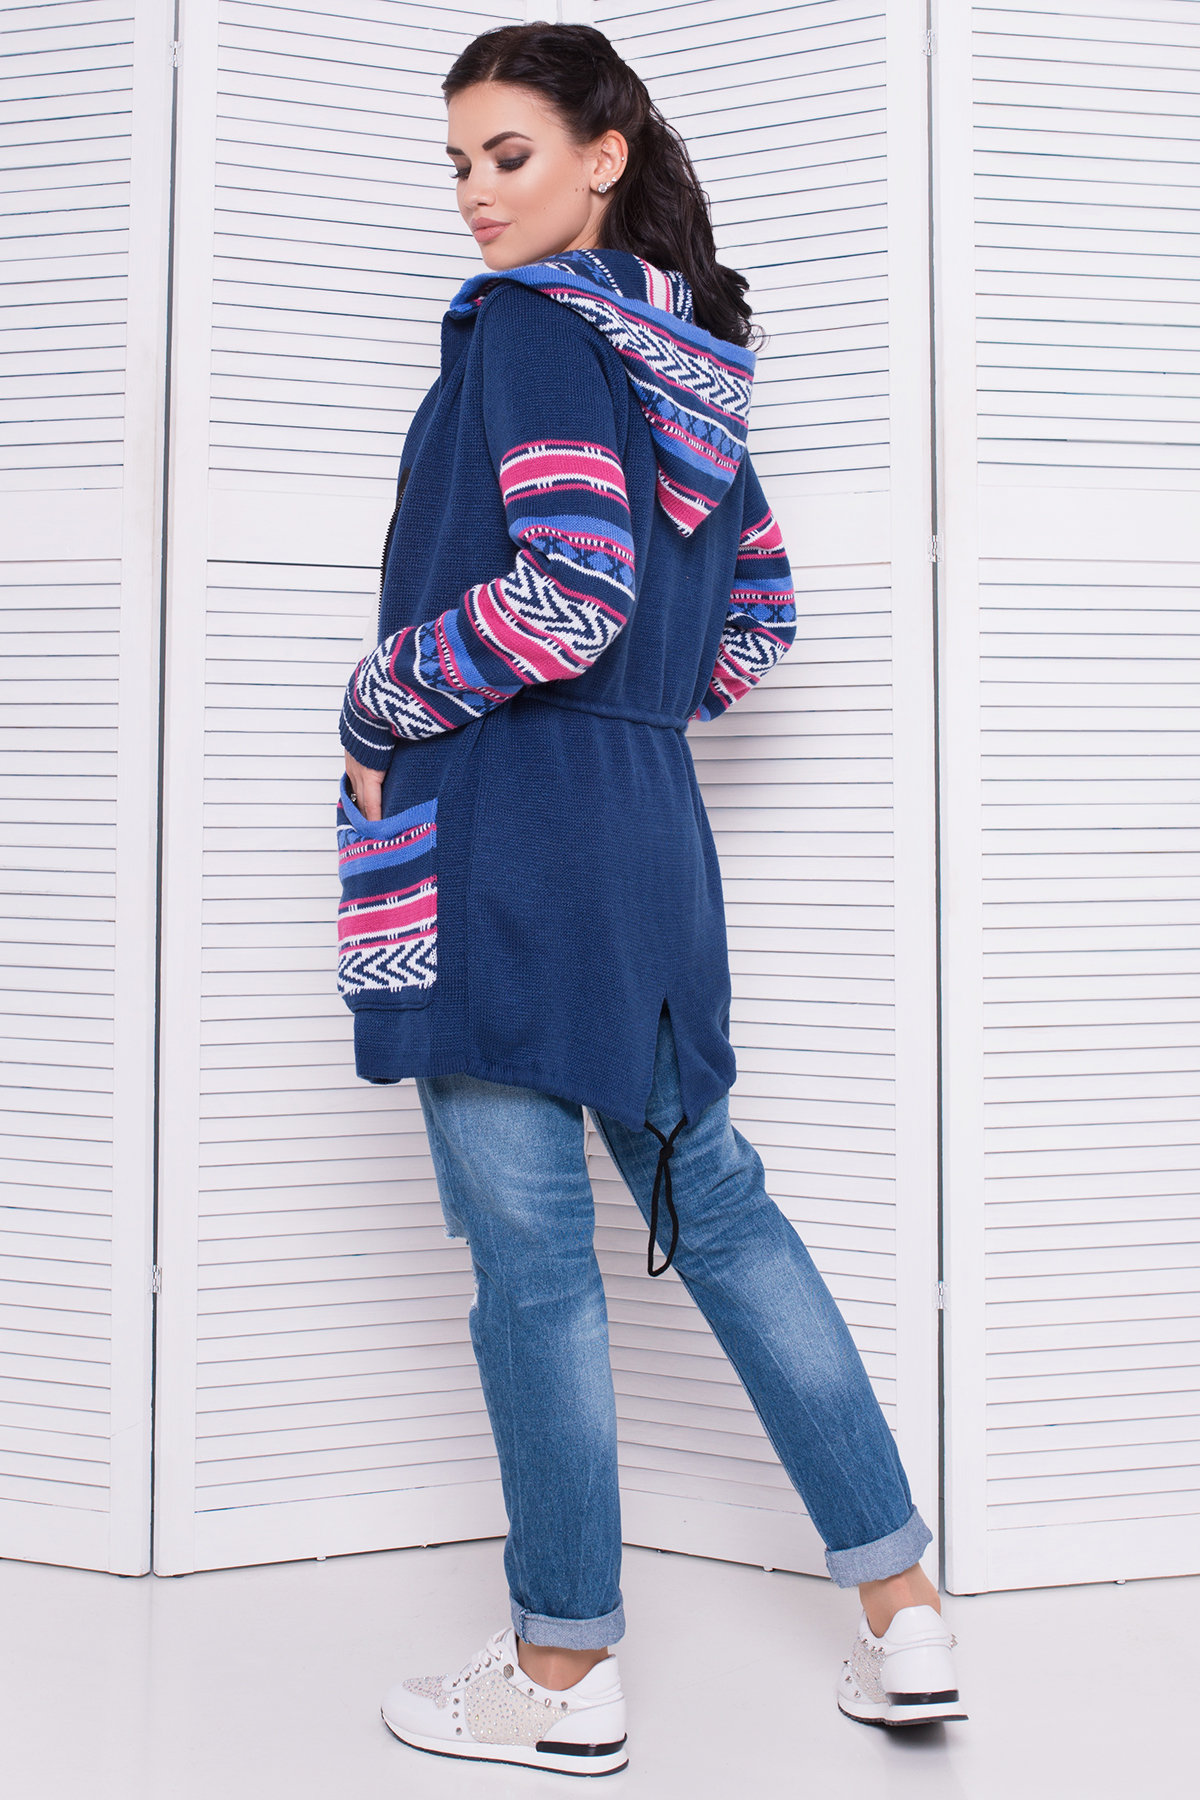 Парка вязаная 3454 АРТ. 17698 Цвет: джинс/розовый - фото 3, интернет магазин tm-modus.ru